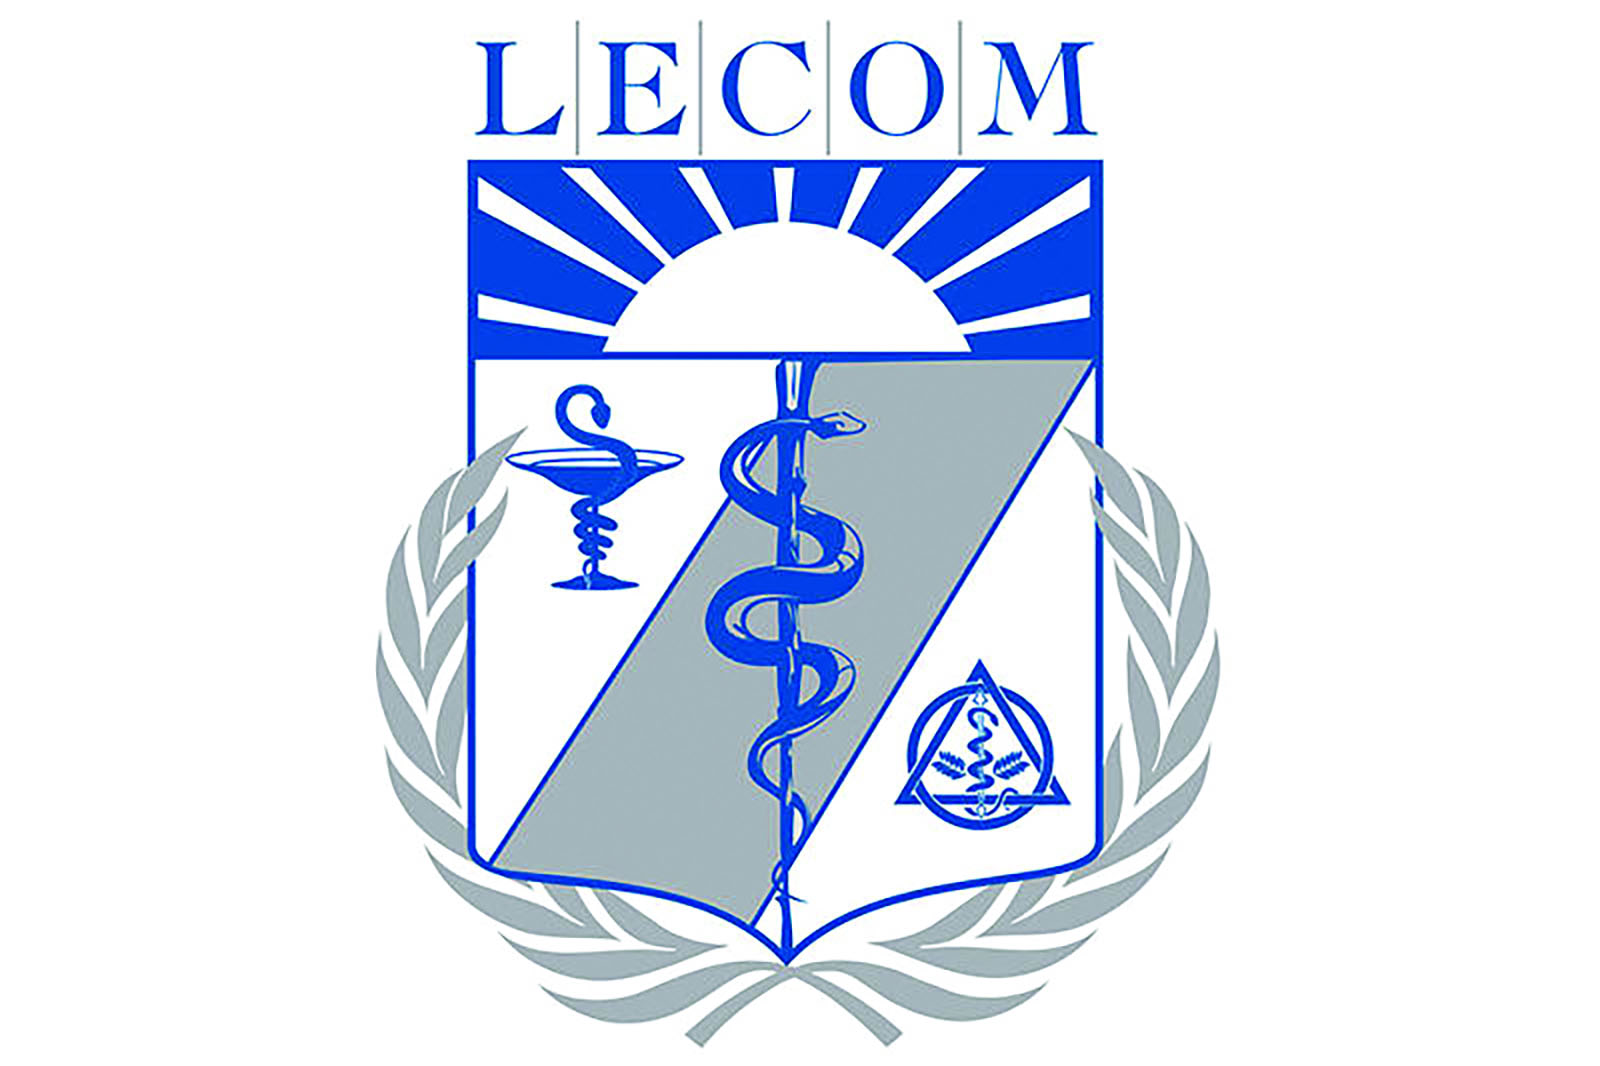 OT students welcome wellness at LECOM